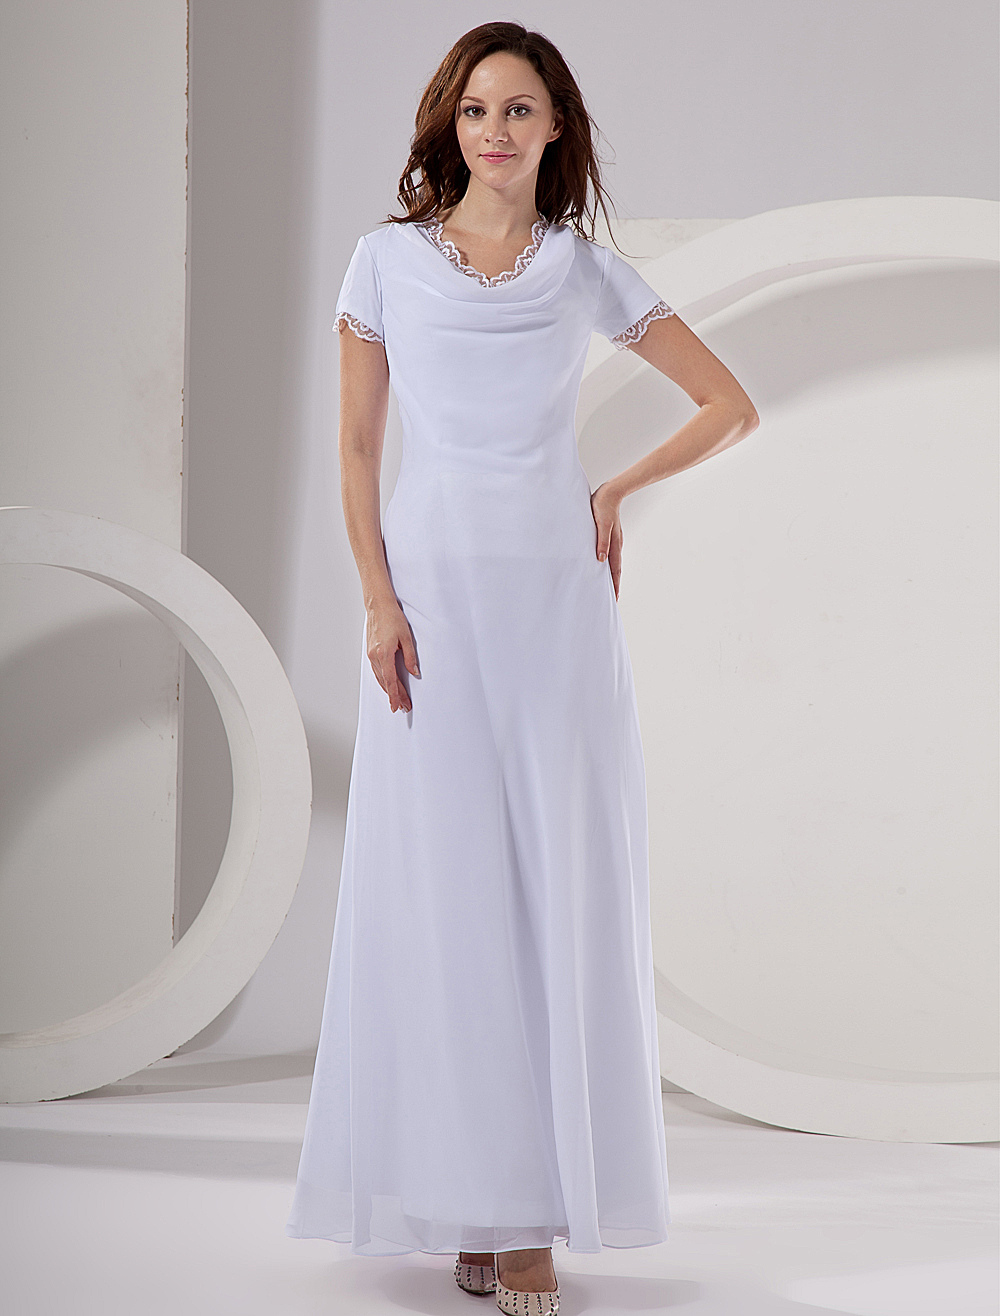 White Chiffon V-Neck Short Sleeve Ladies Evening Dress (Wedding Cheap Party Dress) photo